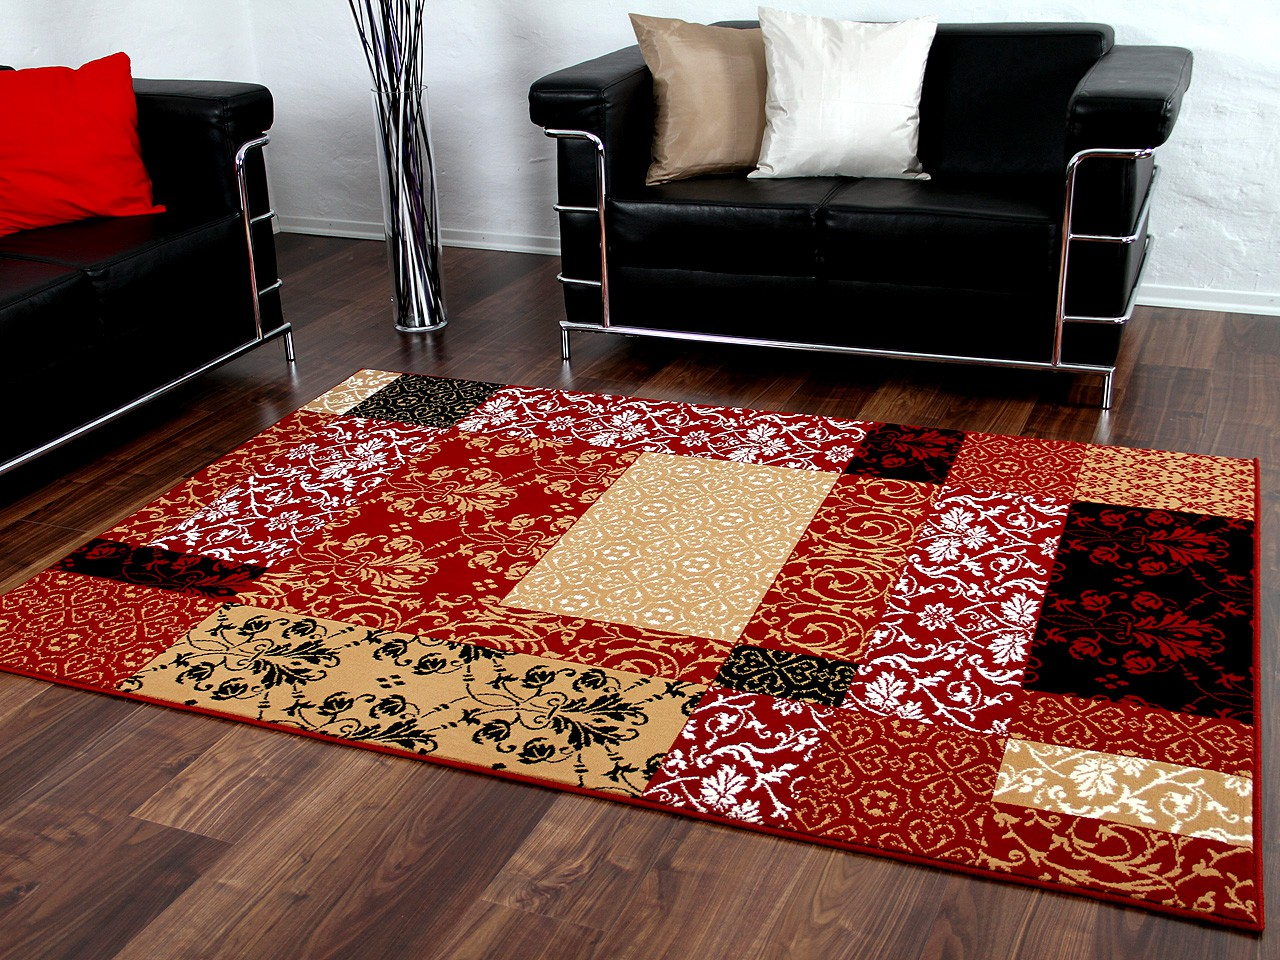 designer teppich passion rot beige patchwork teppiche designerteppiche passion teppiche. Black Bedroom Furniture Sets. Home Design Ideas